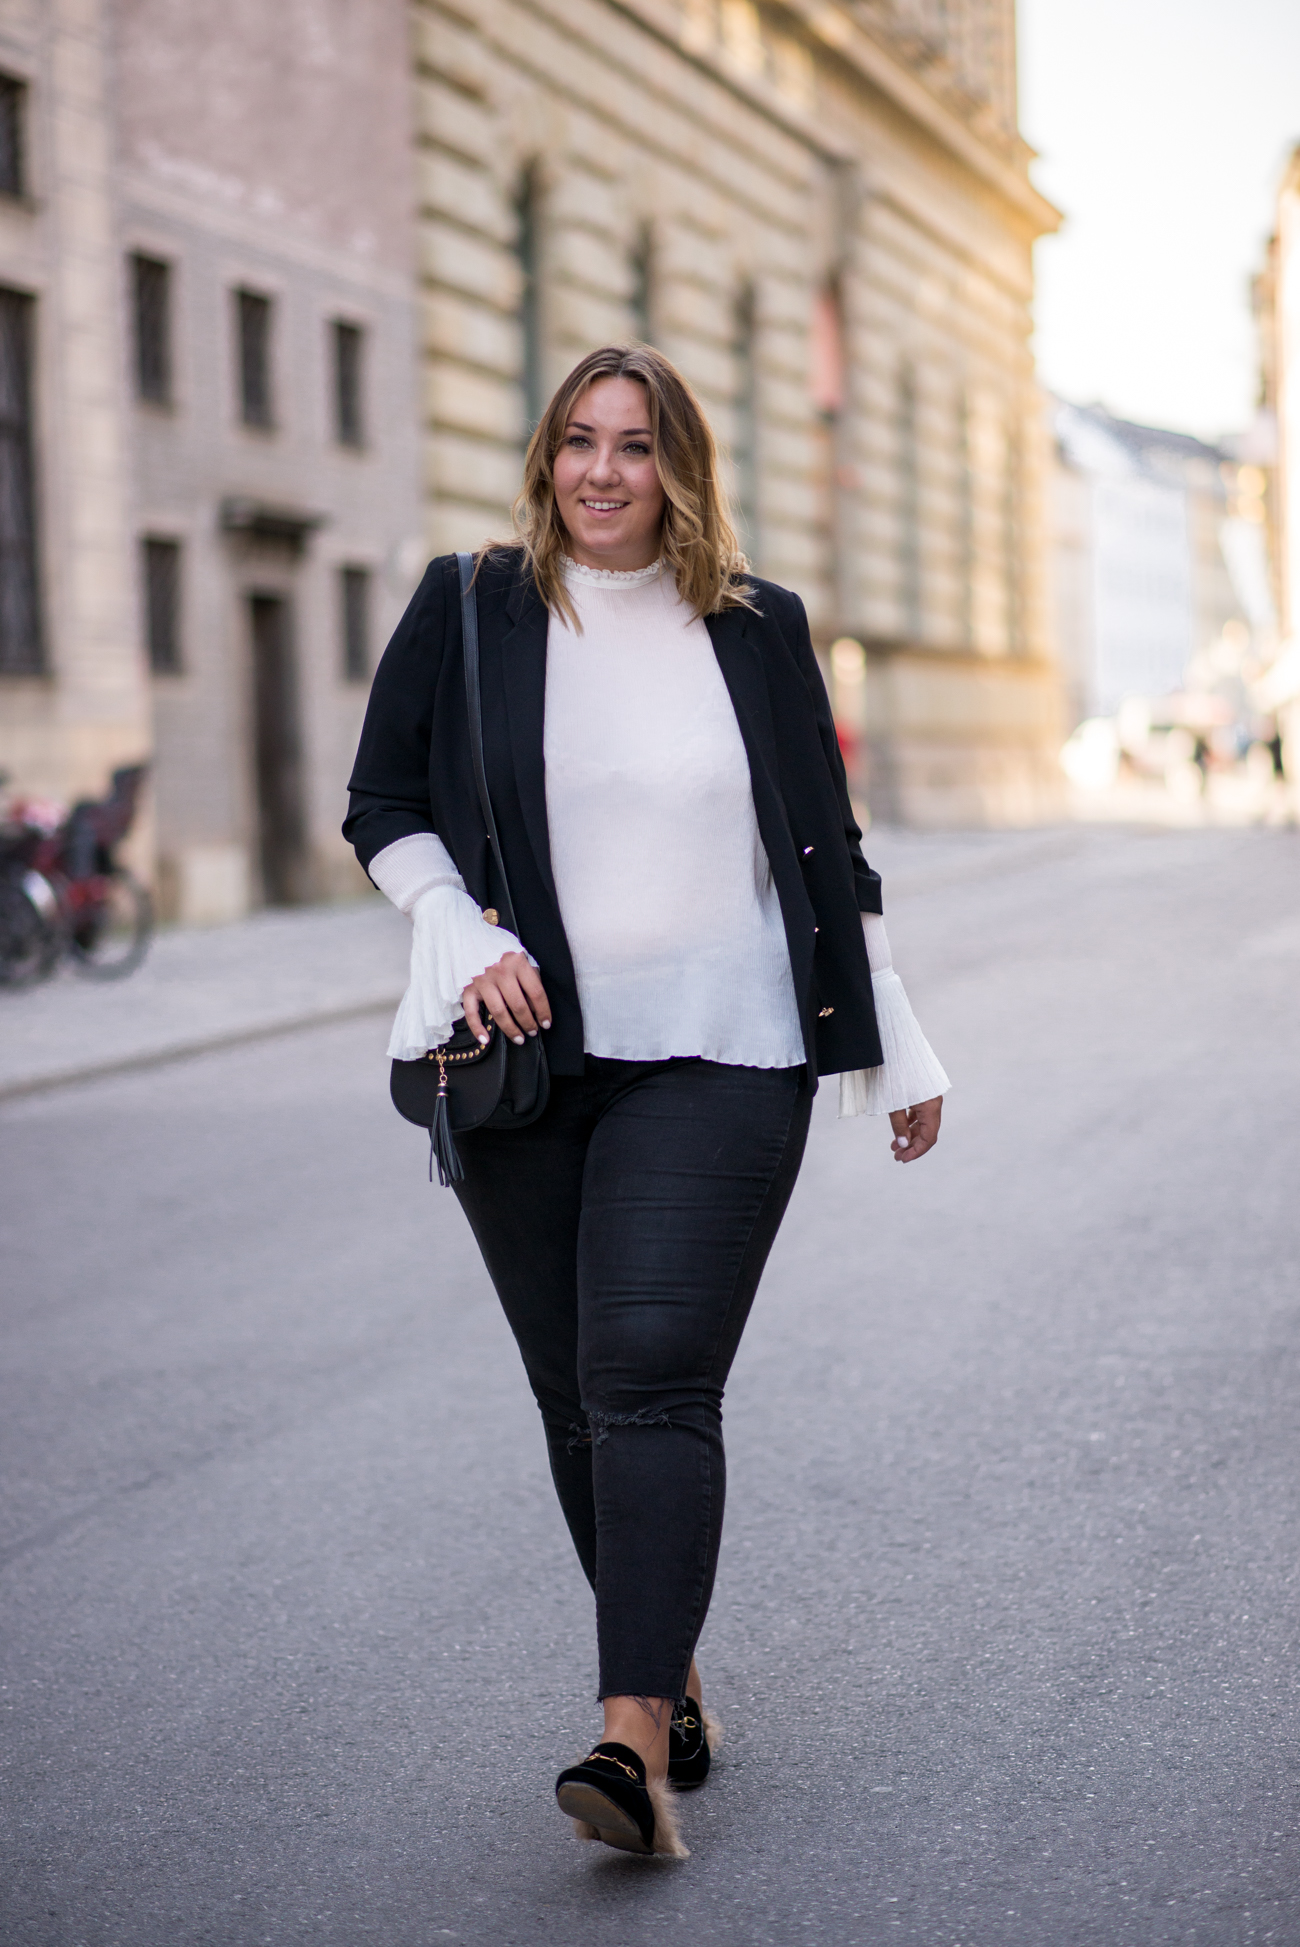 gucci-slipper_gucci-princetown_skinny-and-the-curvy-one_plus_plus-size-blogger_fashion_blogger-deutschland_fashionblogger-munich_curve-7-von-21